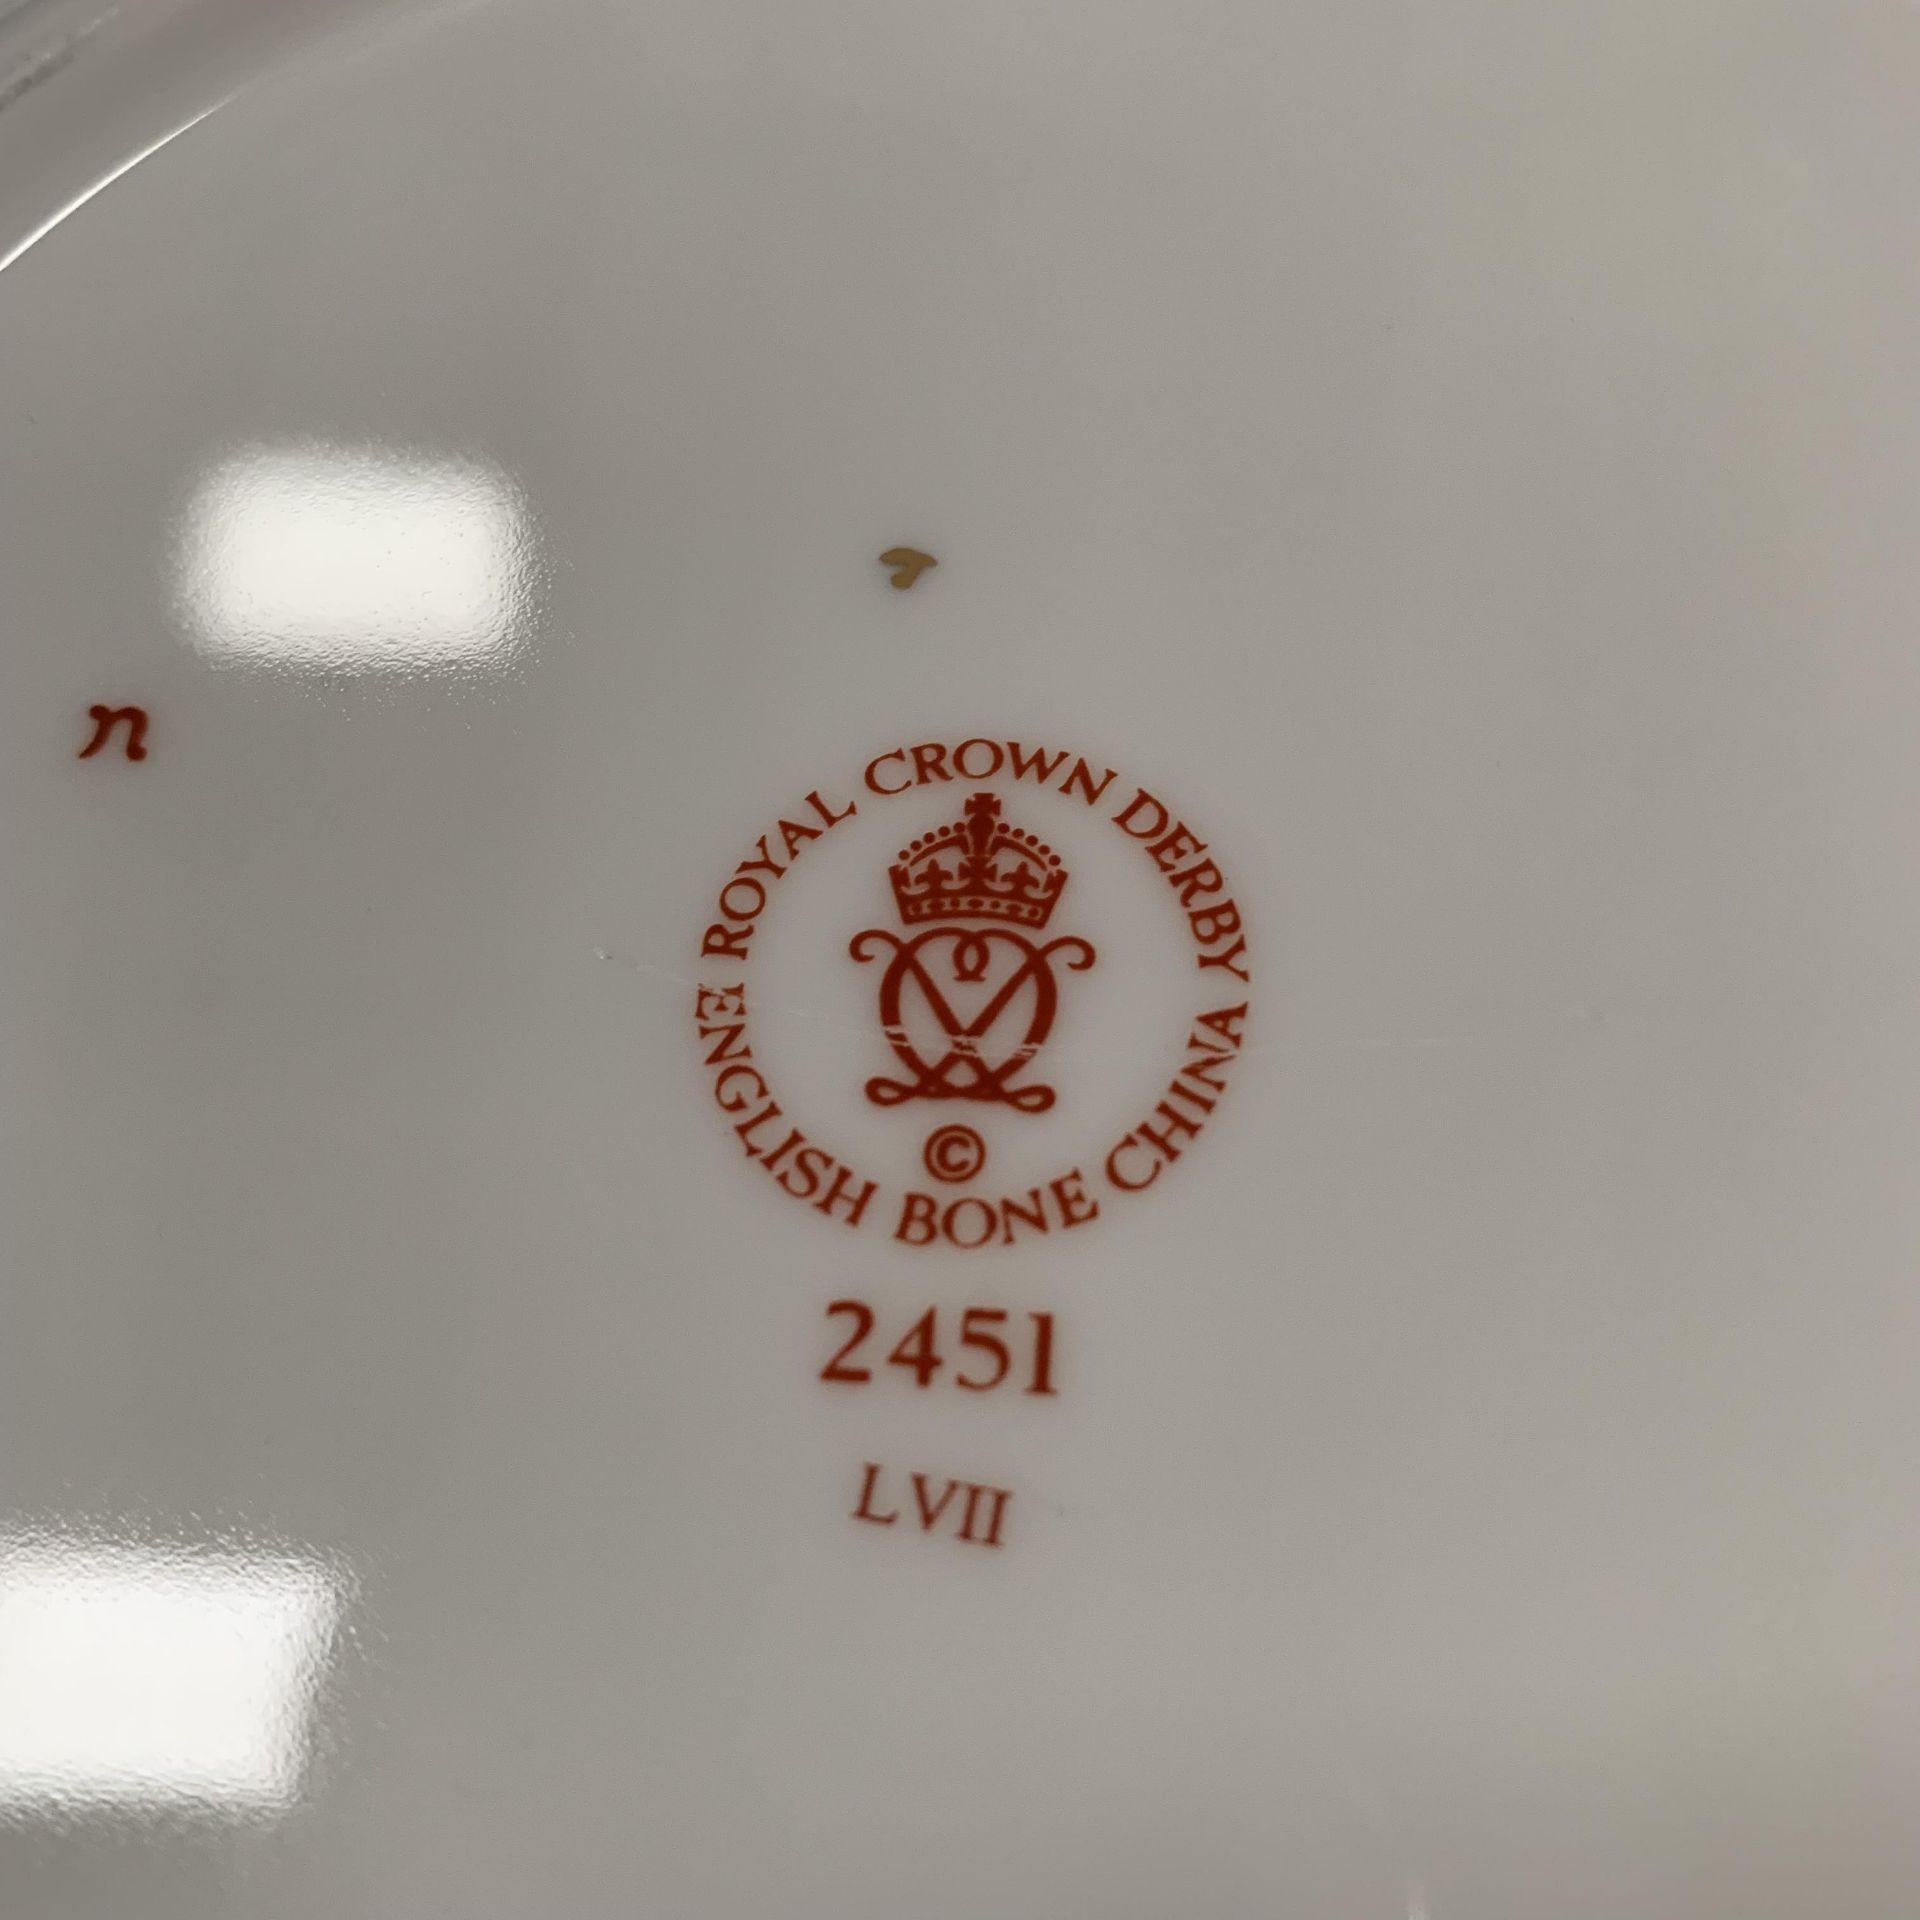 Lot 14 - Royal Crown Derby Imari plate 2451 LVLII